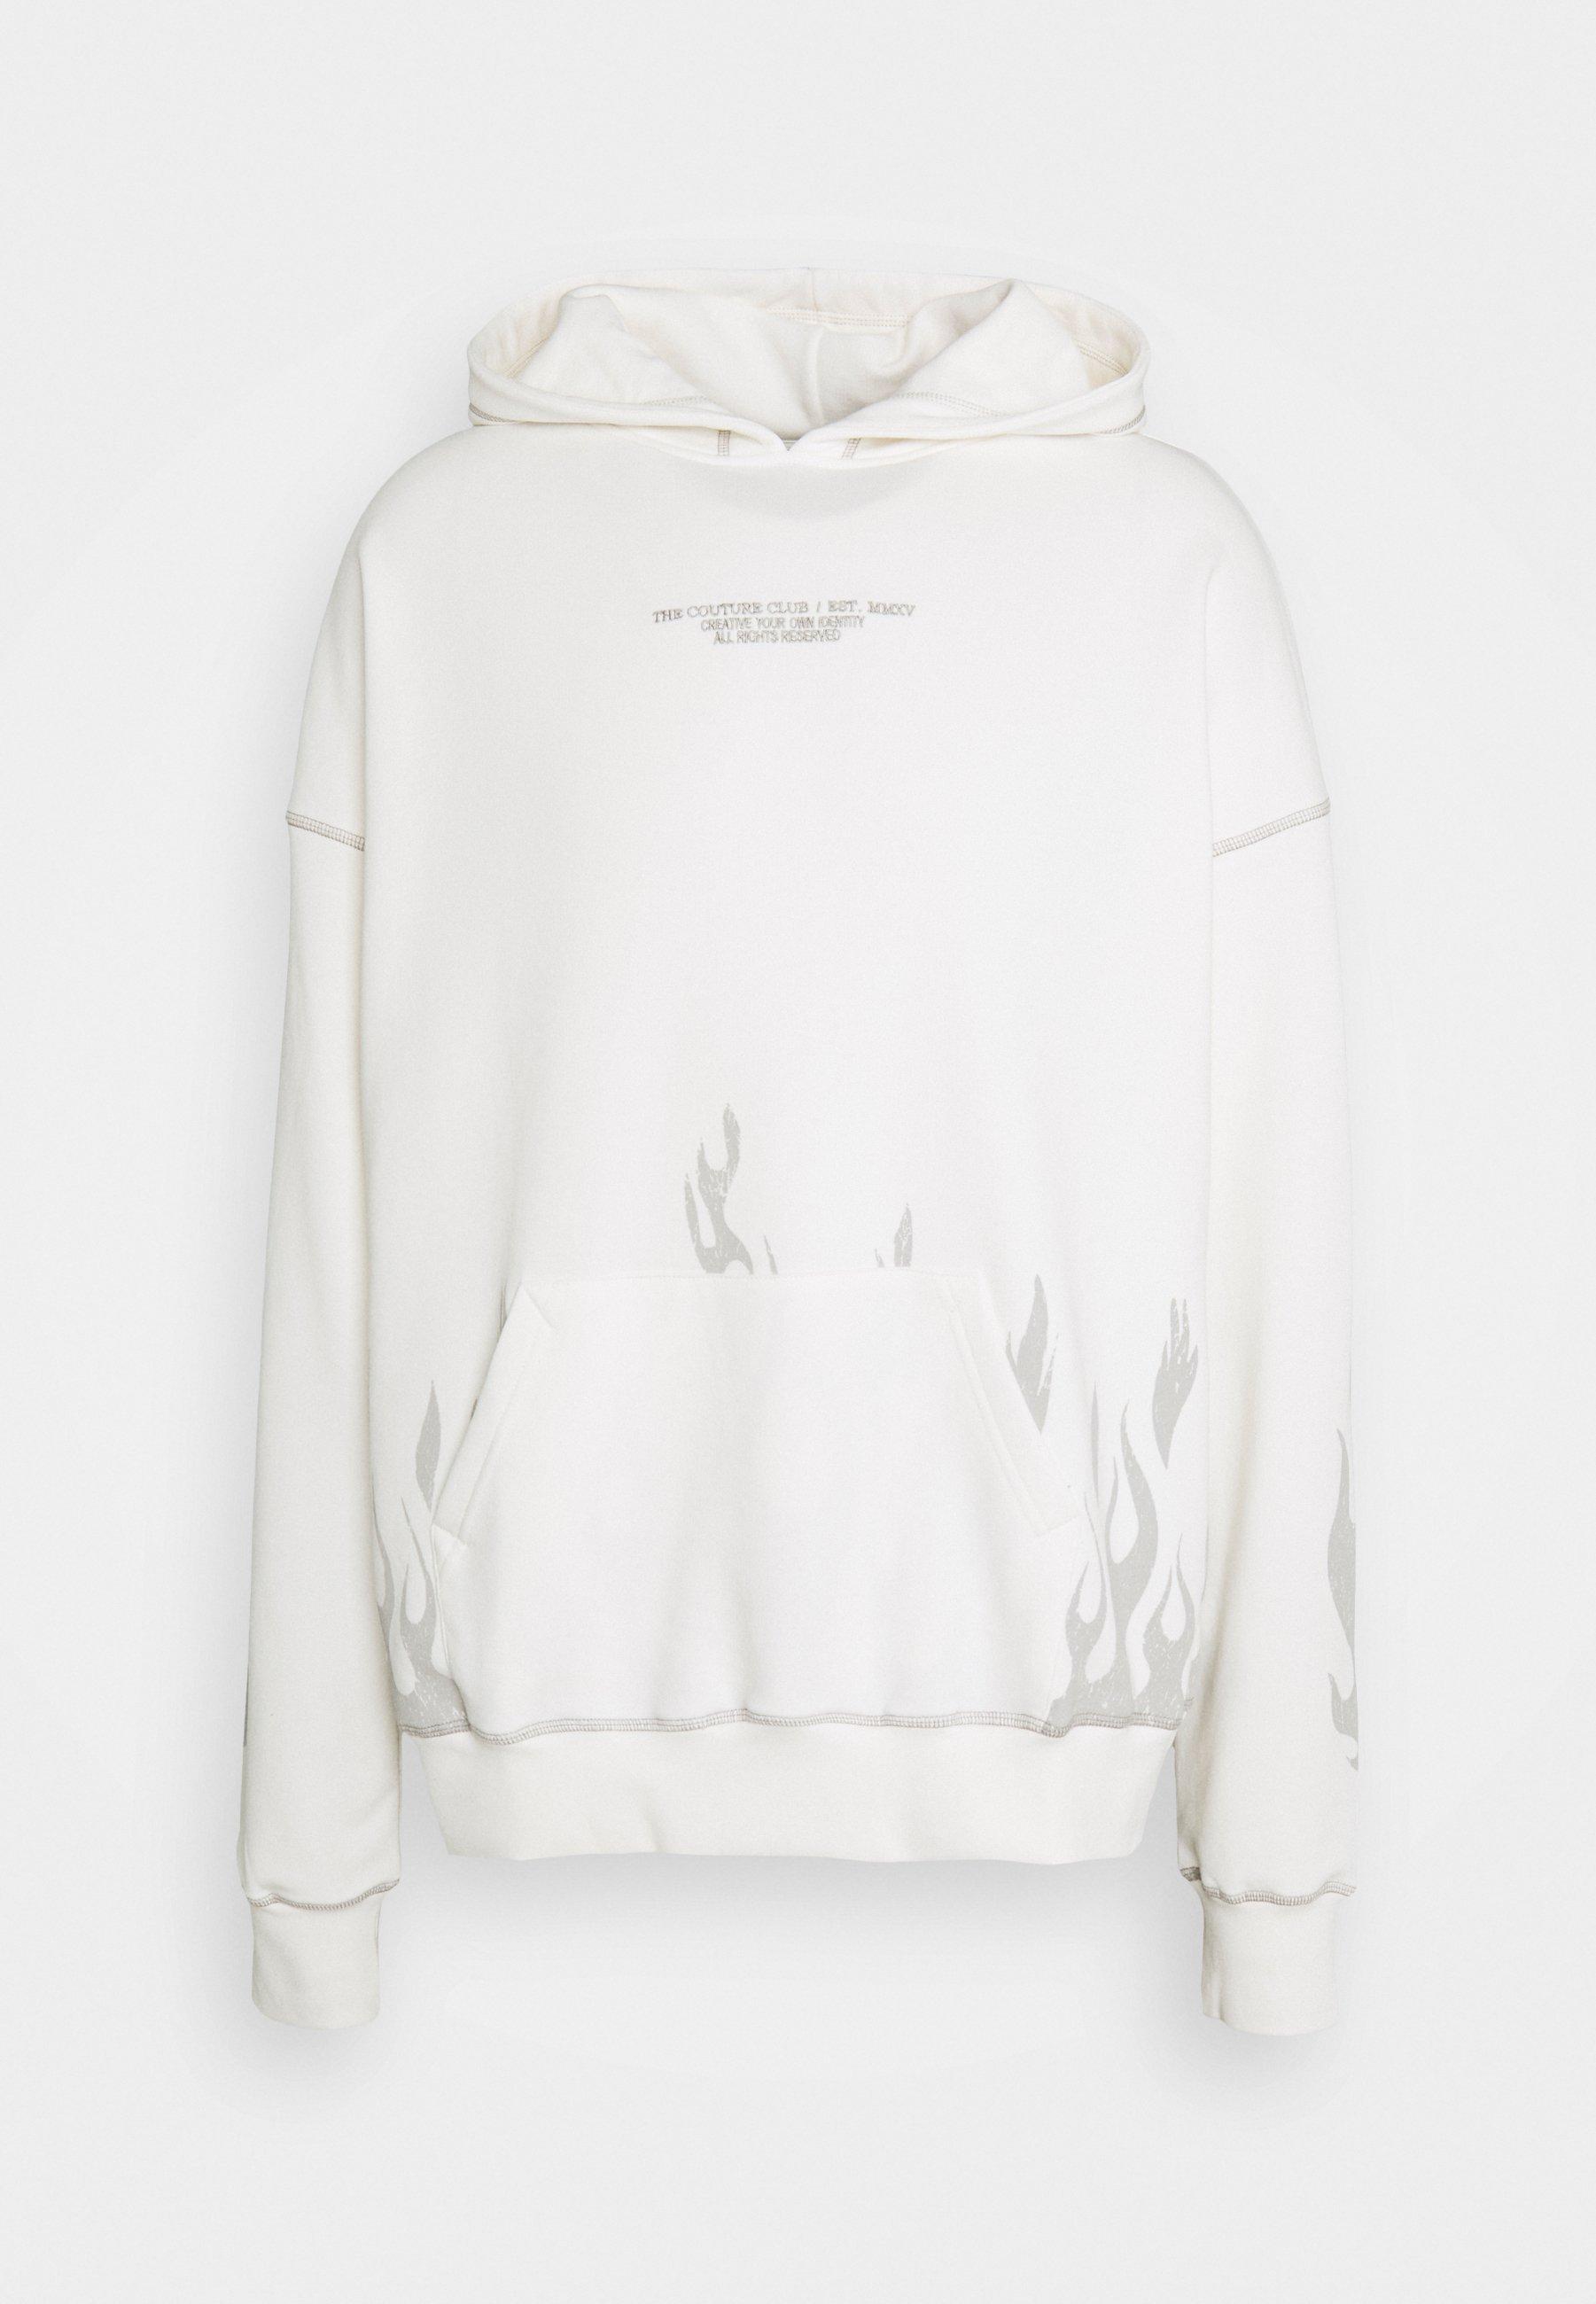 Homme BOXY DISTRESSED FLAME GRAPHIC HOOD - Sweatshirt